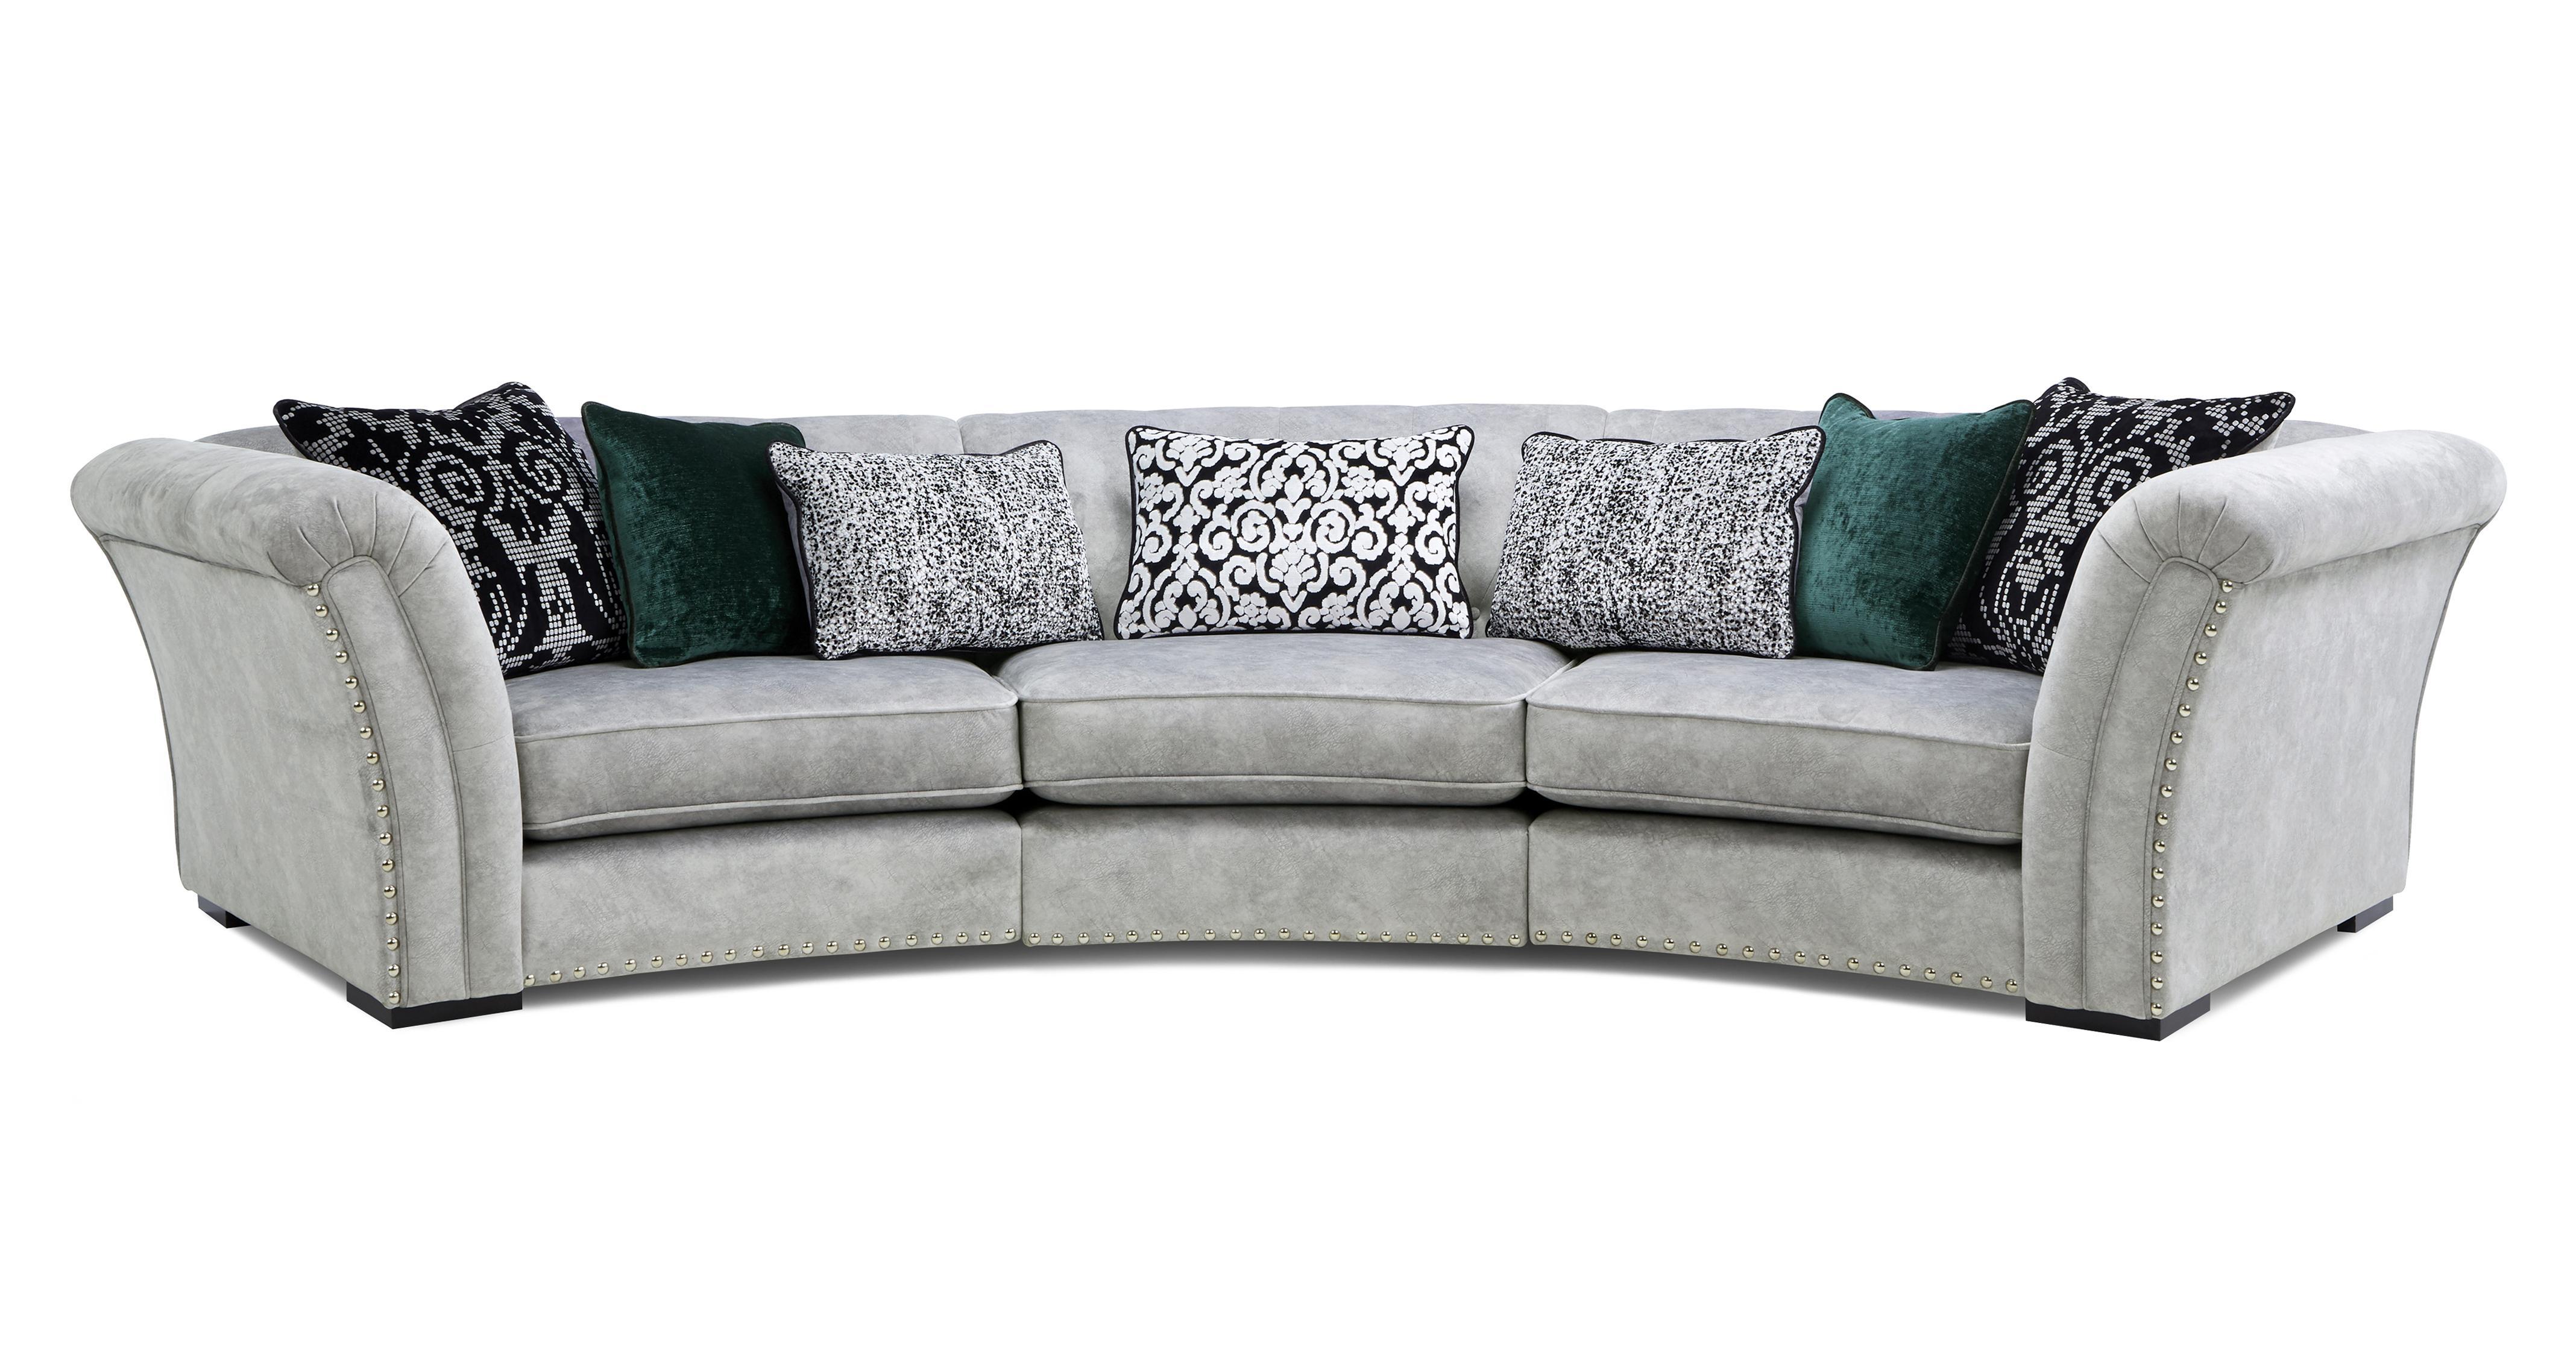 Ffion 3 Piece Curved Sofa Ffion Plain Dfs